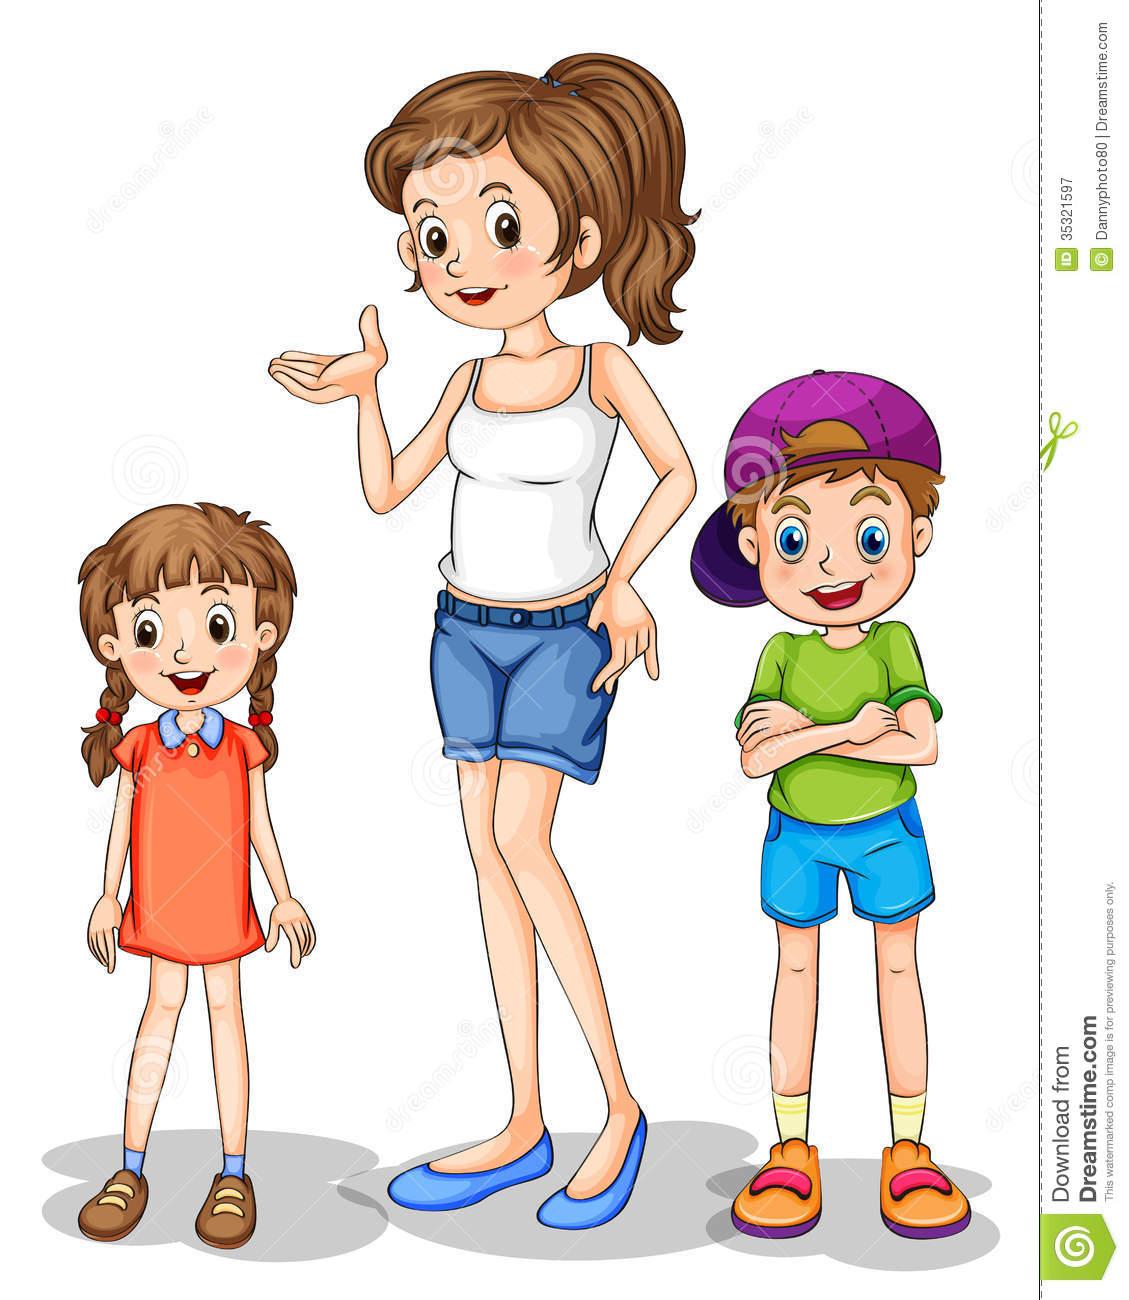 Short and tall clipart clip art transparent download Short and tall woman clipart free - ClipartFest clip art transparent download